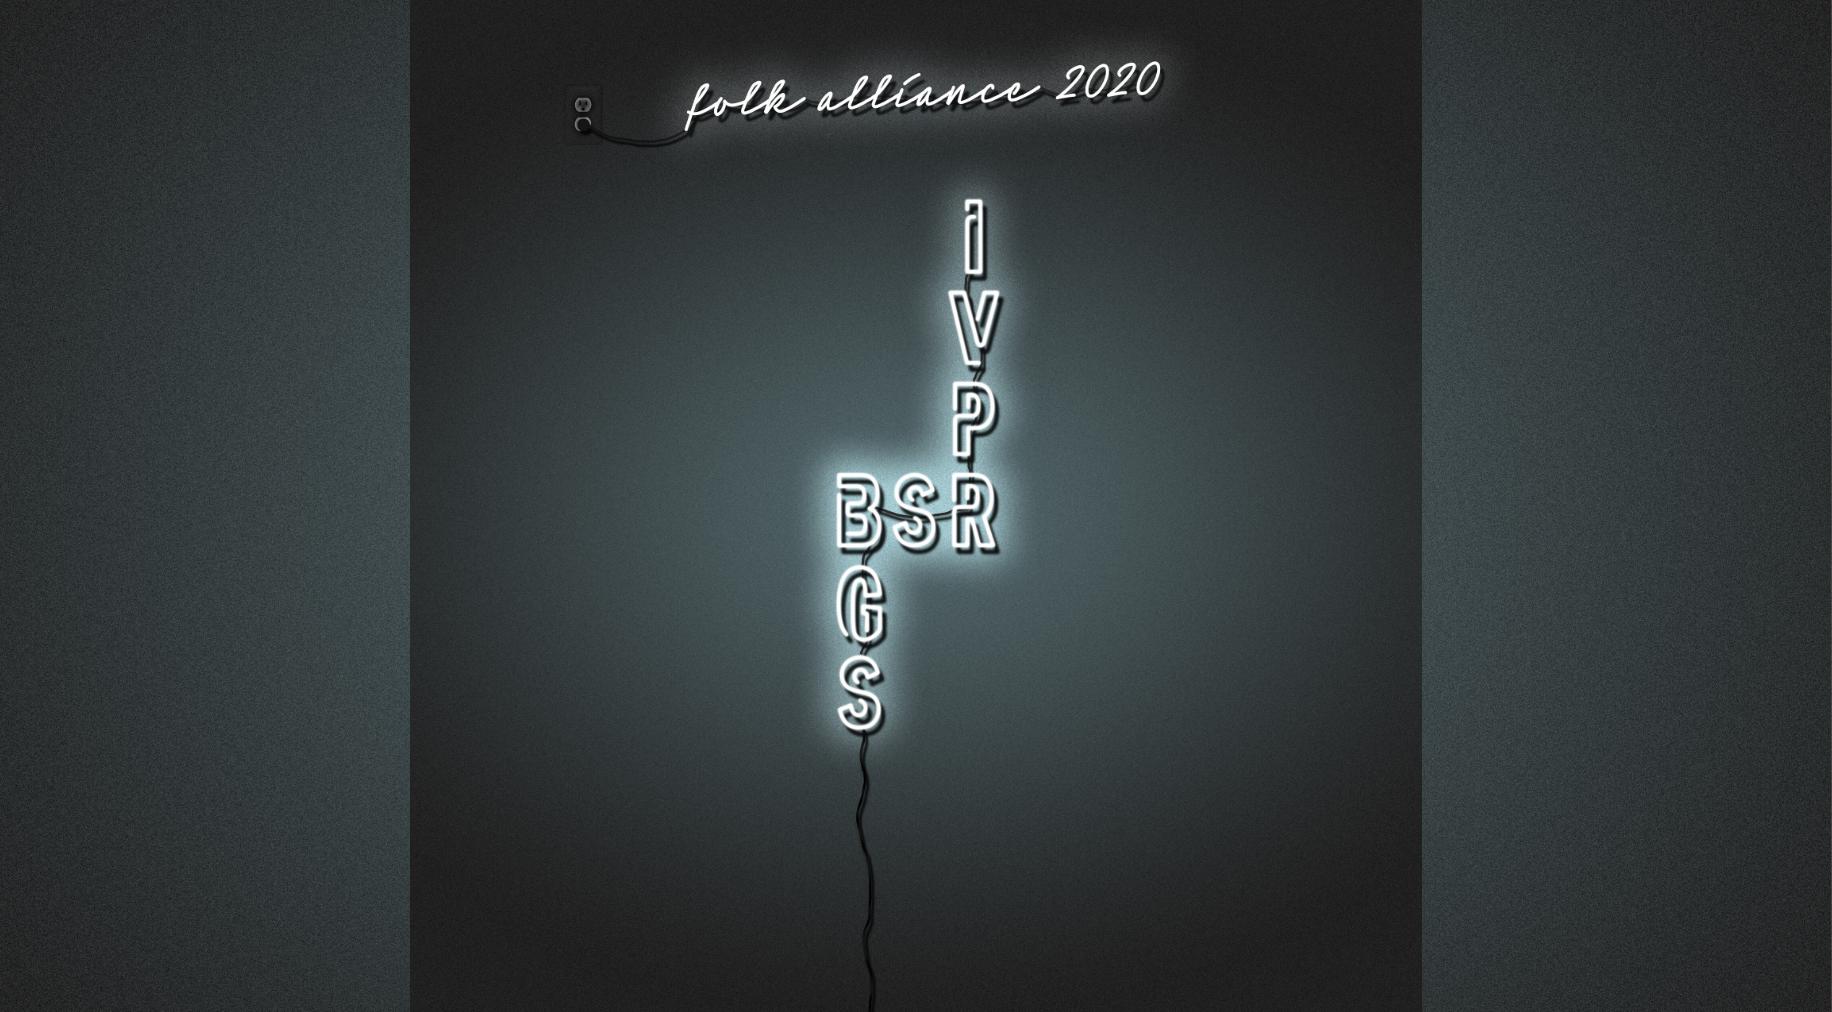 ANNOUNCING: BGS, IVPR, Bloodshot Records Partner for Folk Alliance 2020